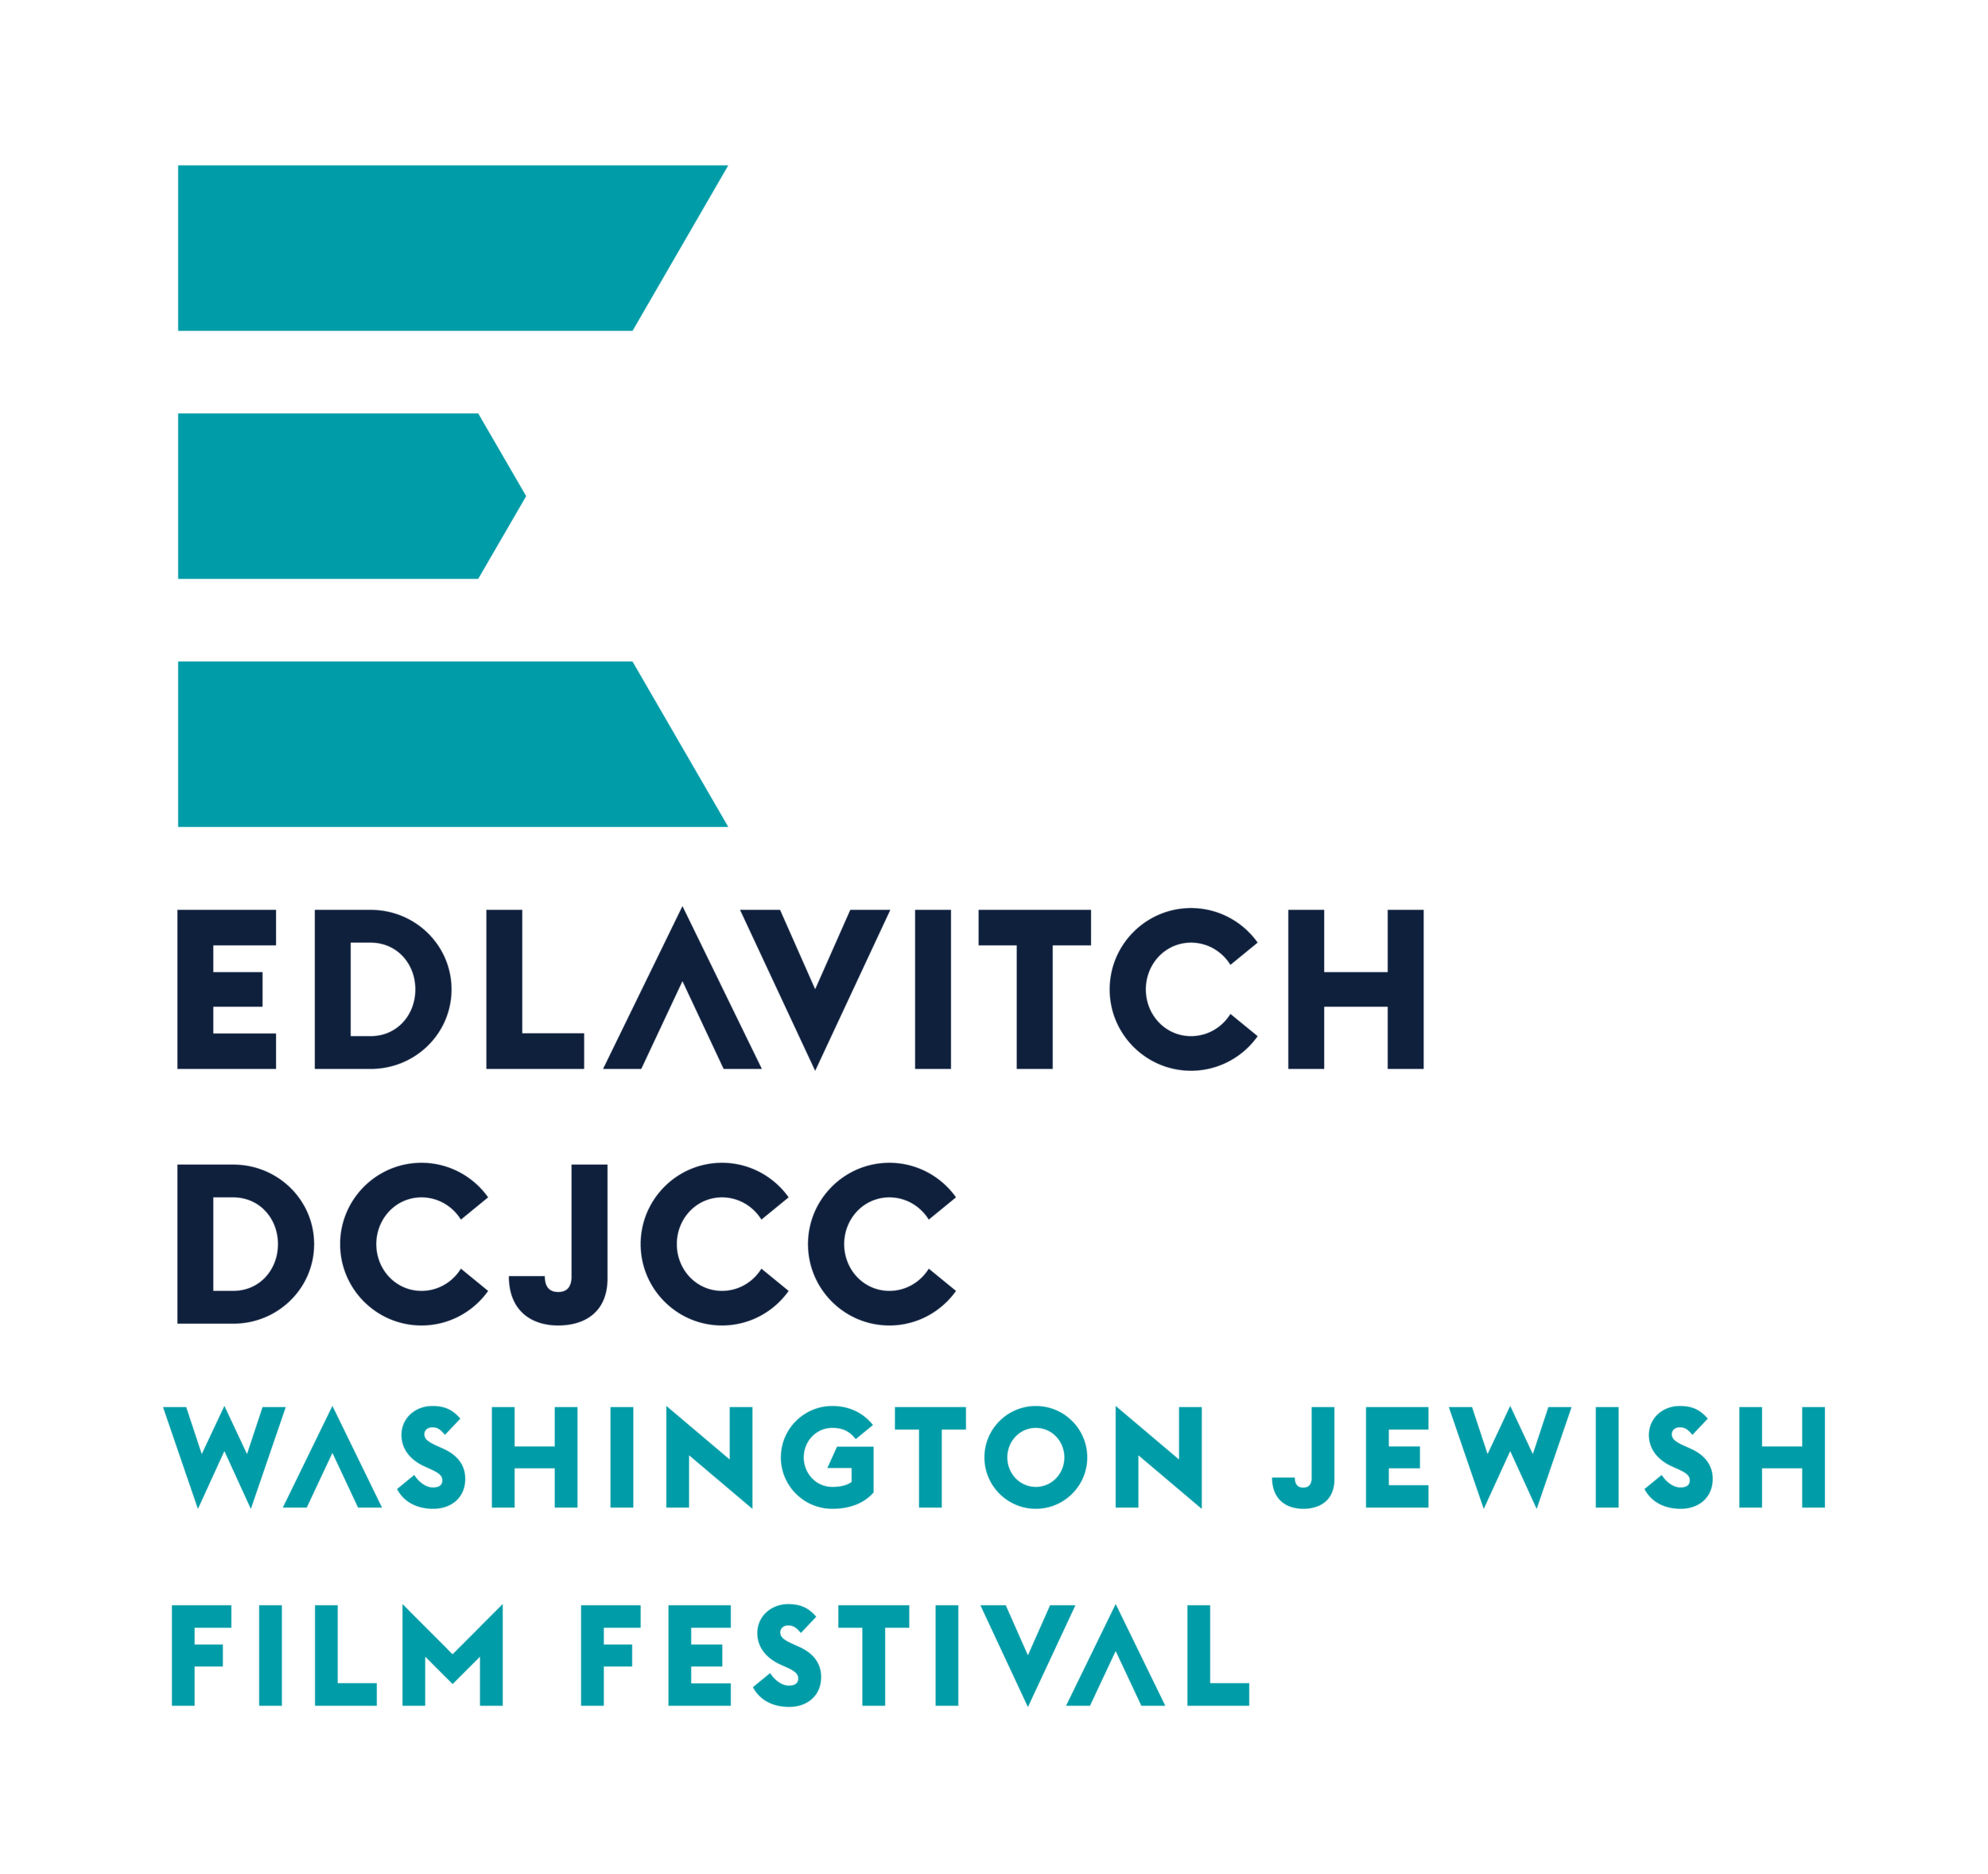 WASHINGTON JEWISH FILM FESTIVAL